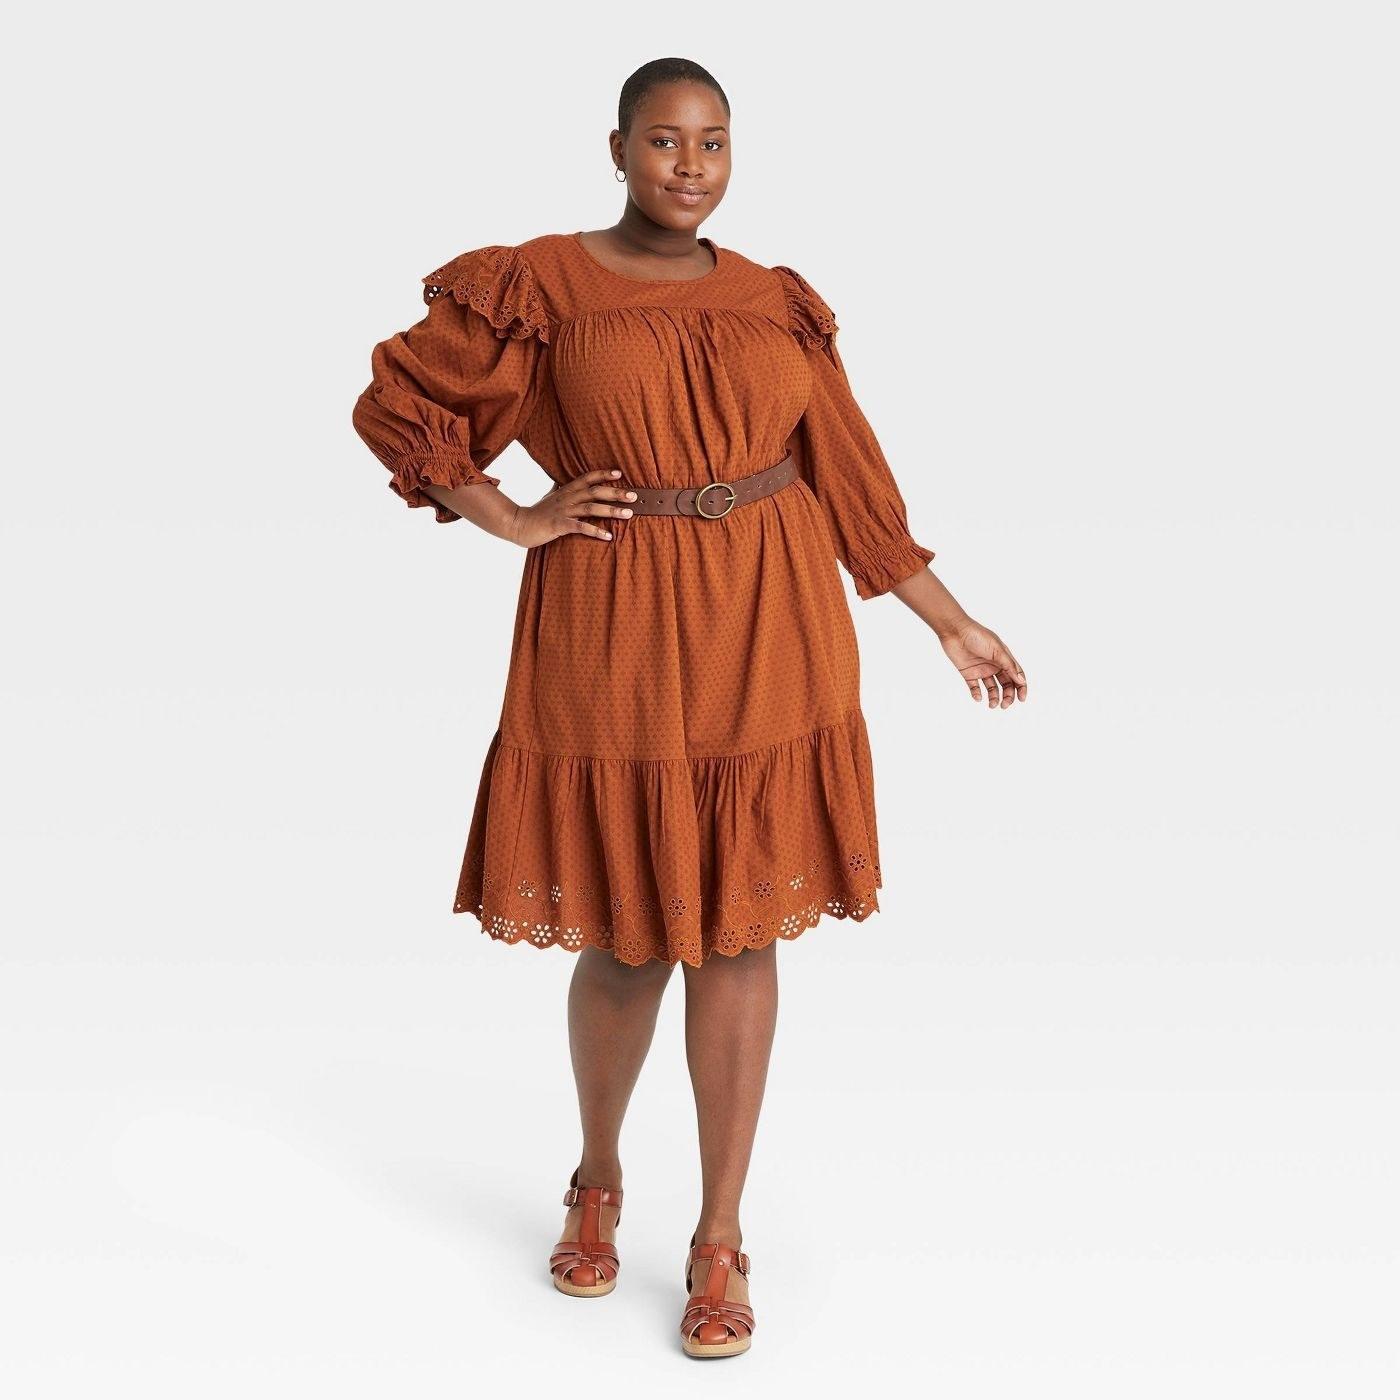 Model wearing burnt orange dress, stops at the knees